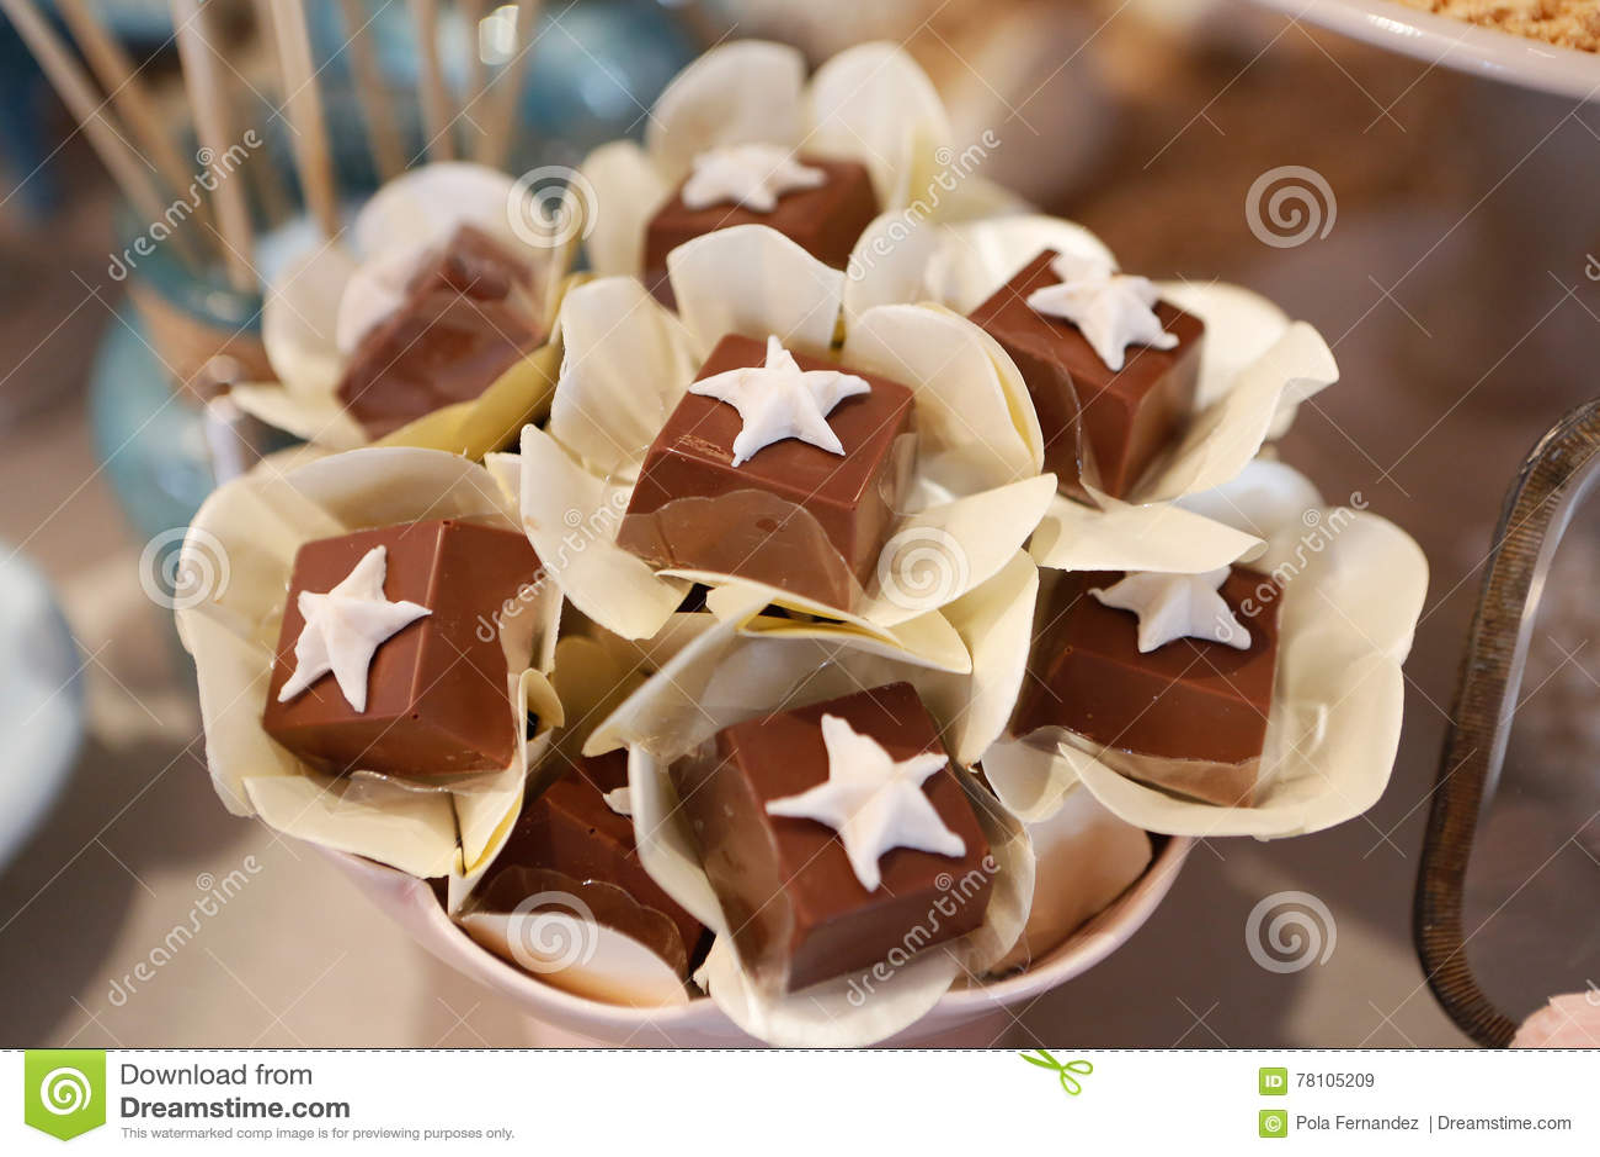 Beautiful Gourmet Tiny Pastry Stock Image Image Of Fresh Calories